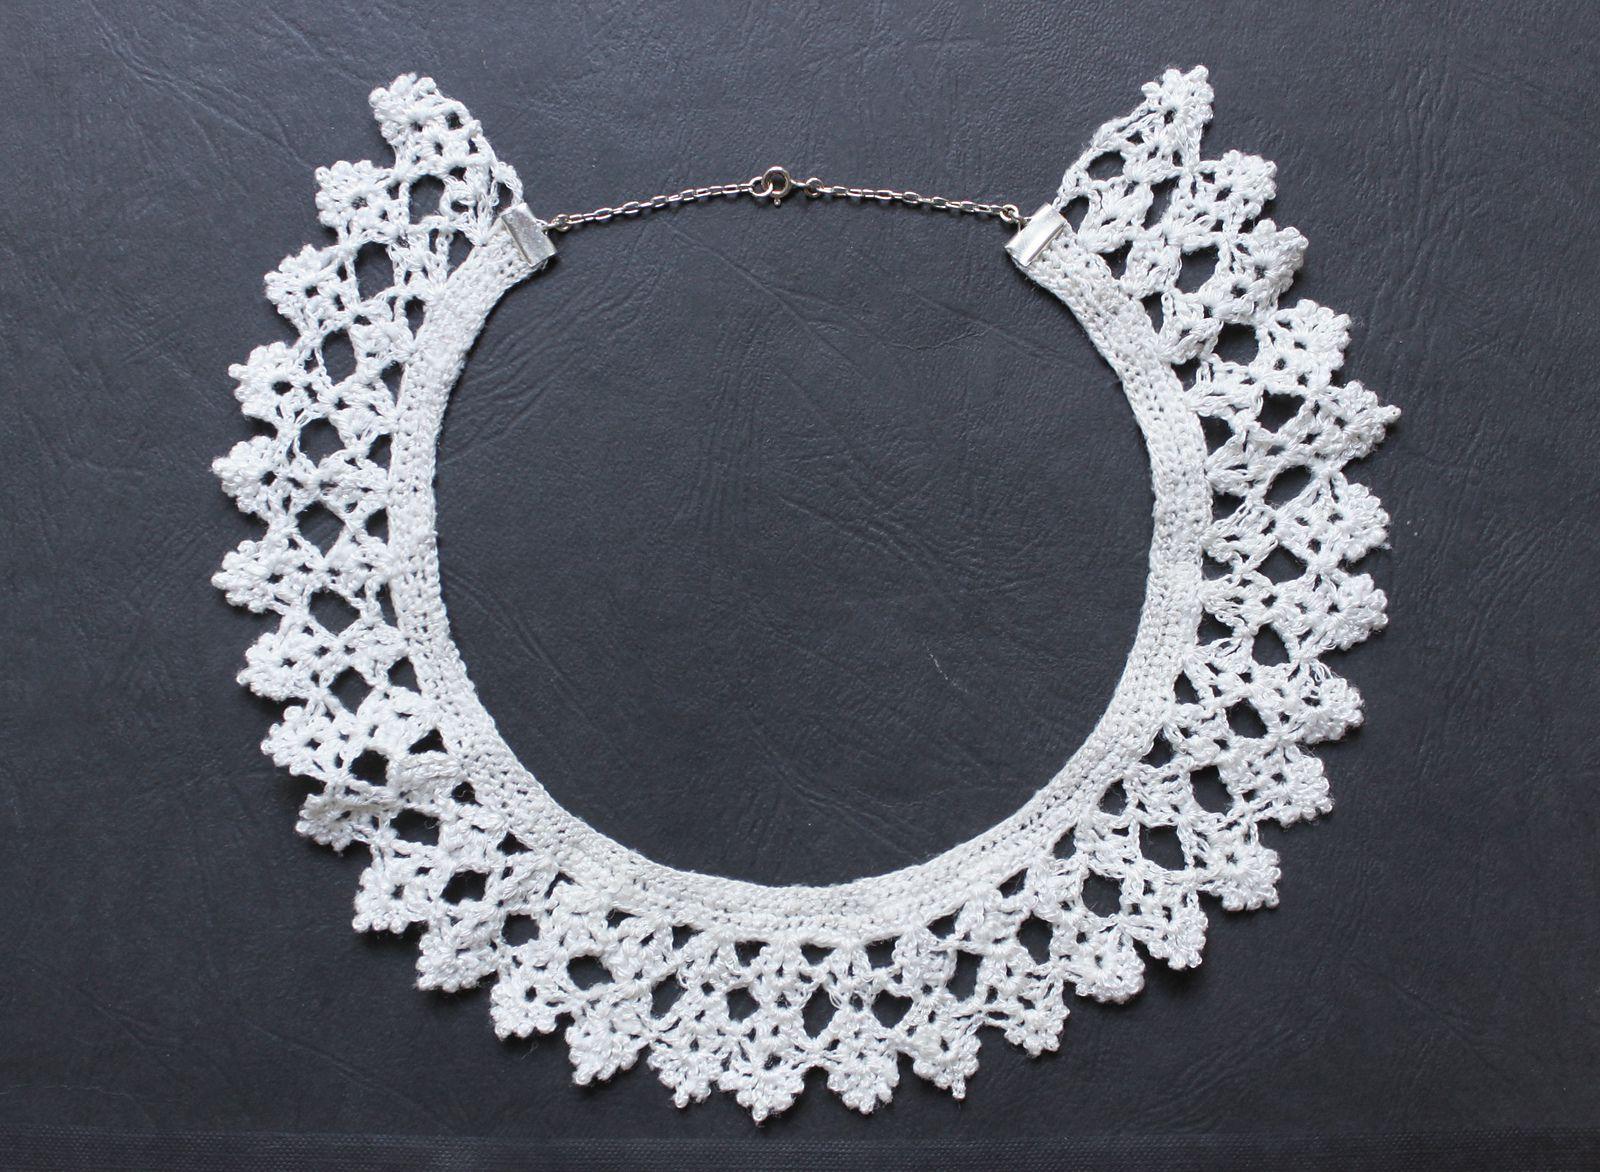 10 Crochet Lace Collar Patterns